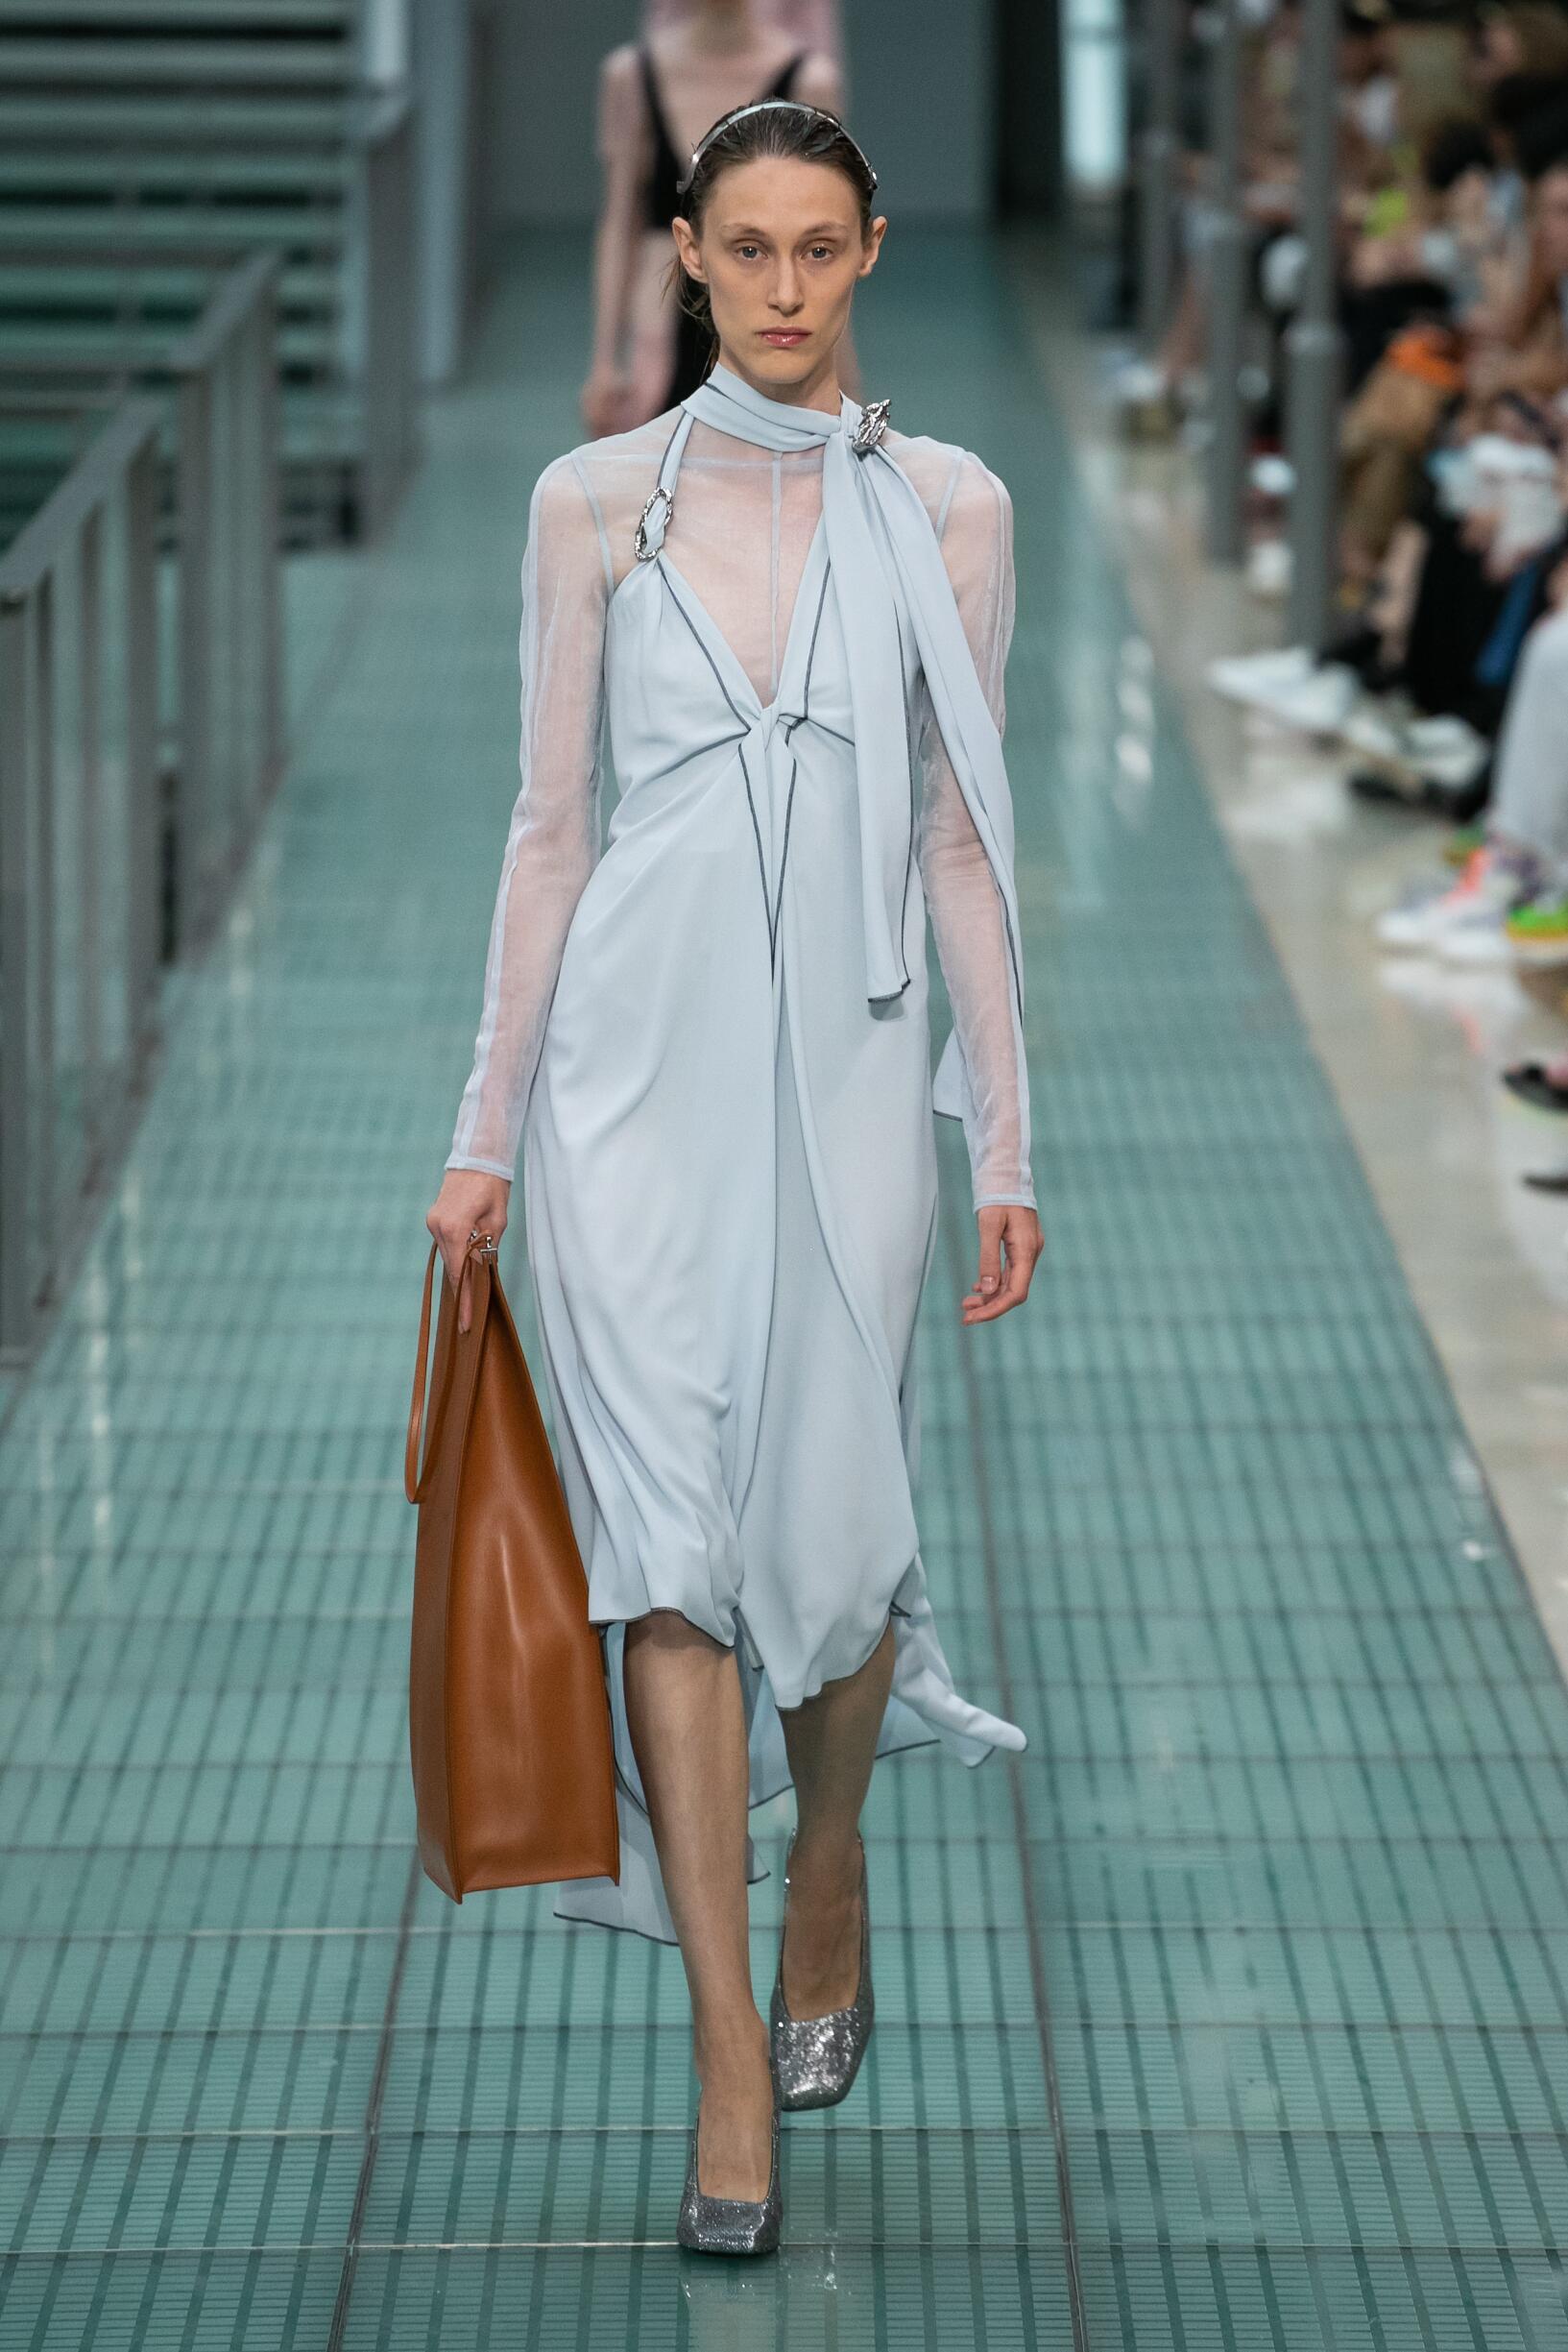 SS 2020 Alyx Show Paris Fashion Week